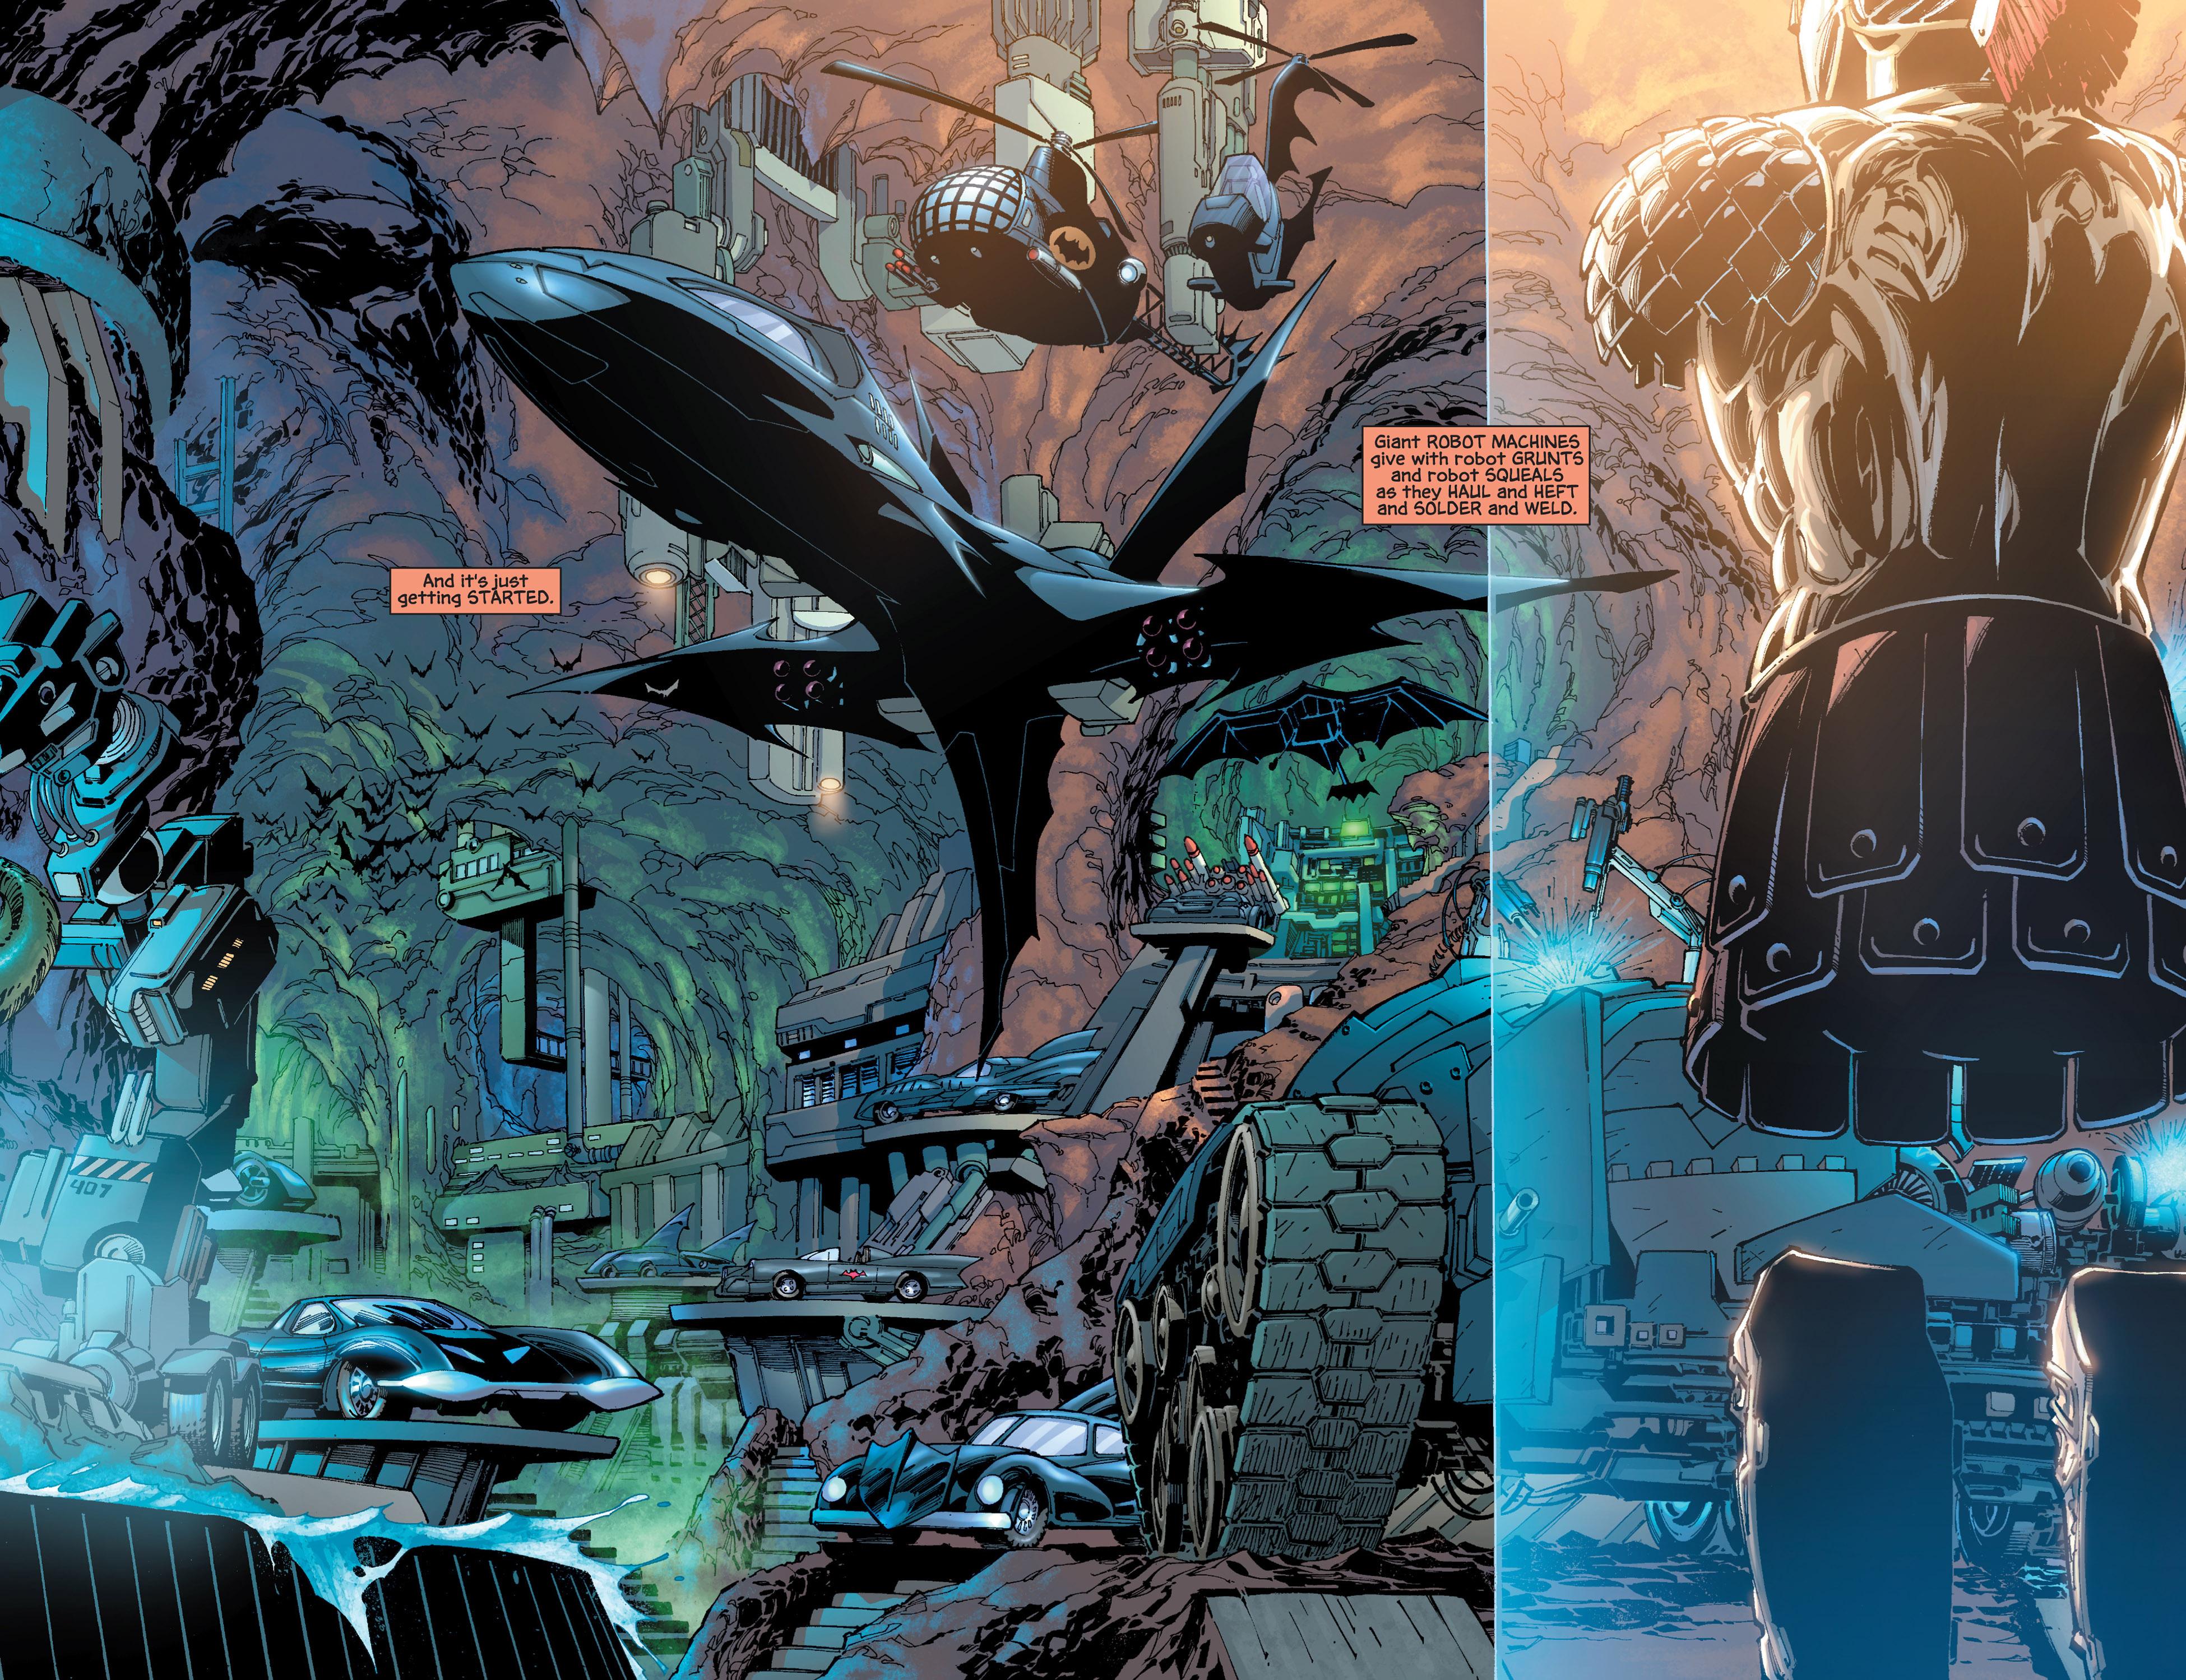 Read online All Star Batman & Robin, The Boy Wonder comic -  Issue #4 - 10